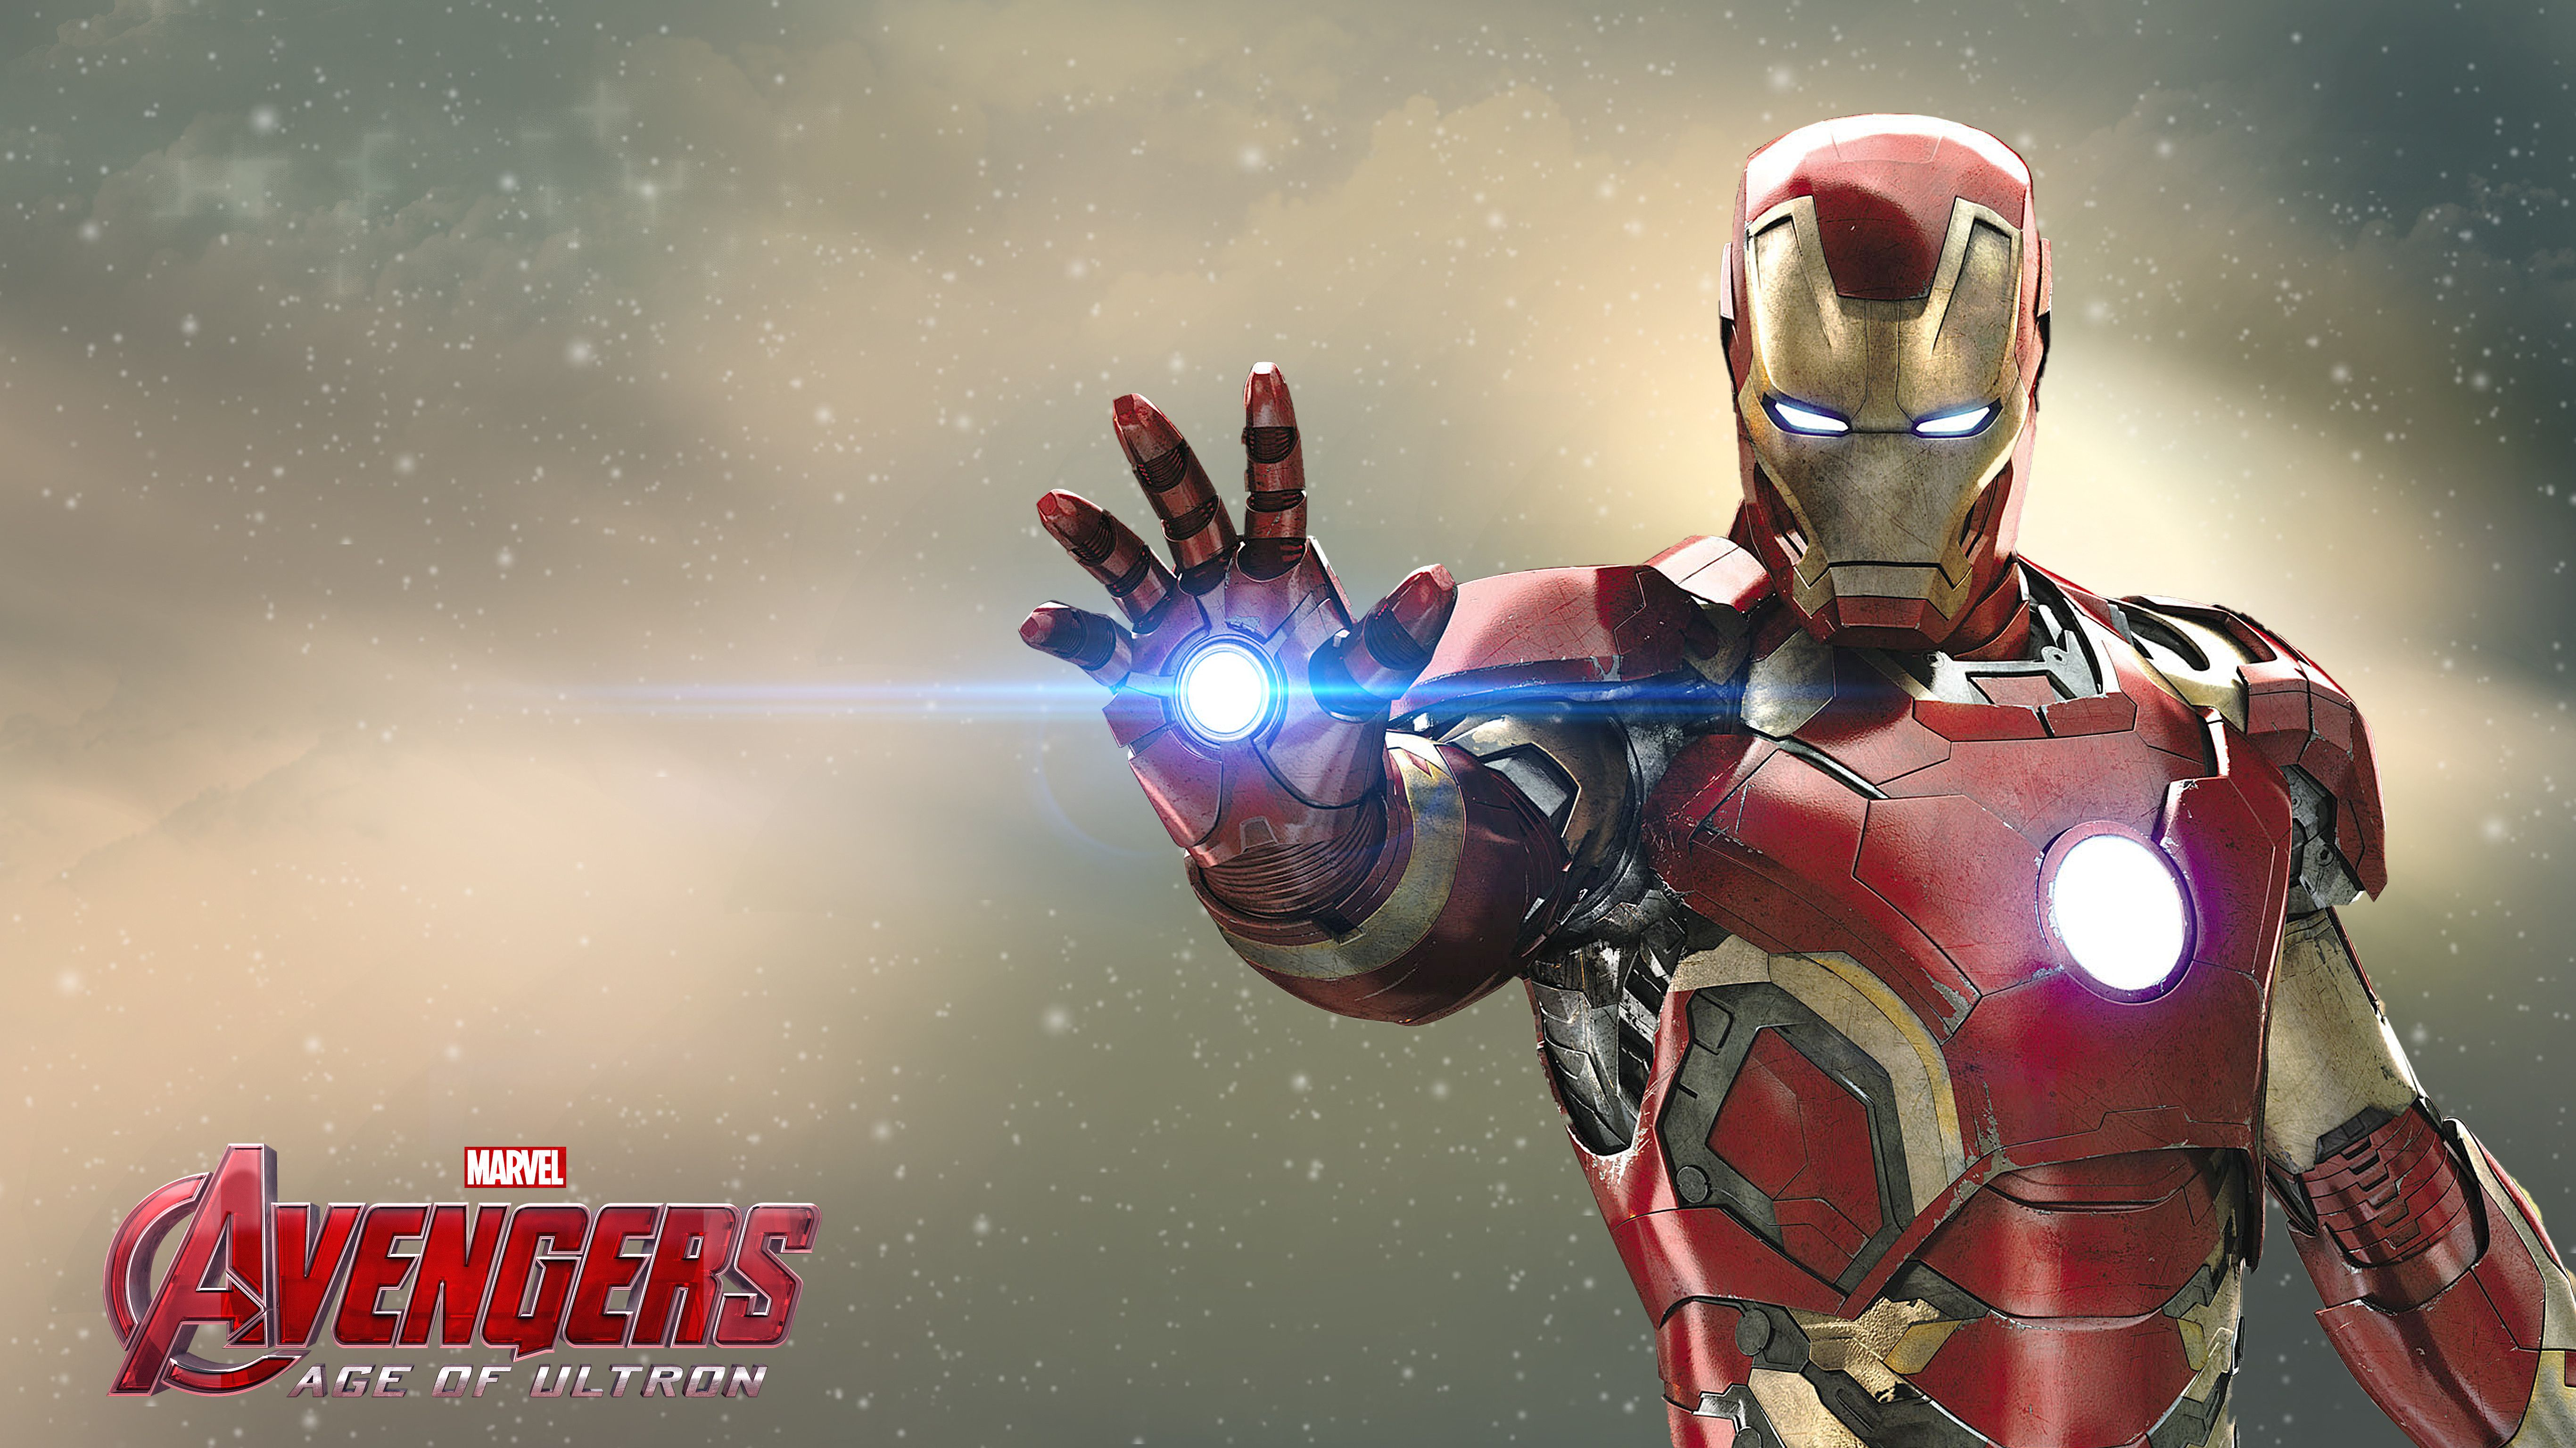 Marvel And Dc Comics Images Memes Wallpaper And More Iron Man Poster Iron Man Artwork Iron Man Wallpaper Iron man age of ultron wallpaper